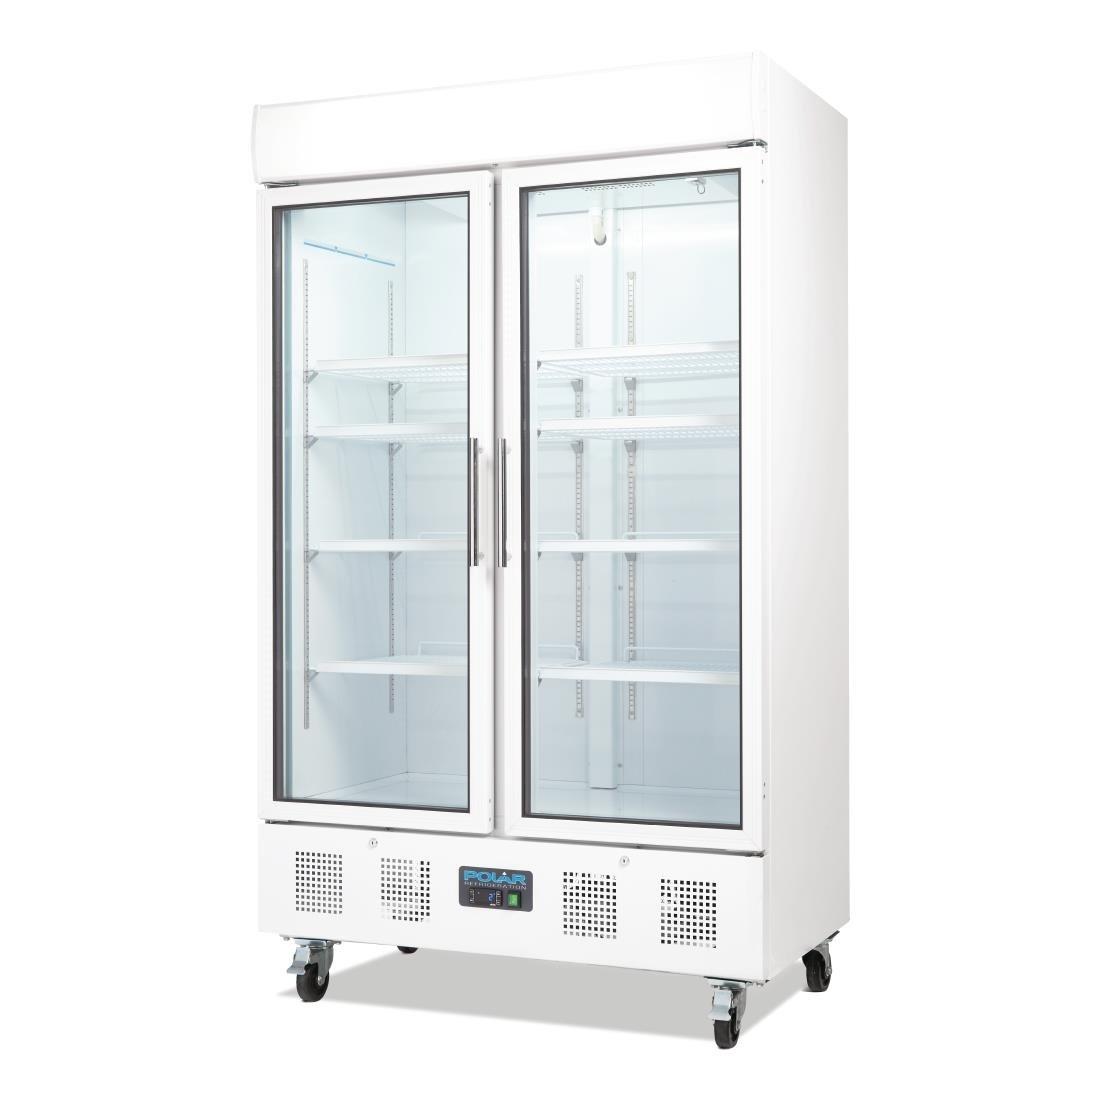 Polar G Series Upright Double Door Display Fridge 944ltr White Polar Refrigeration